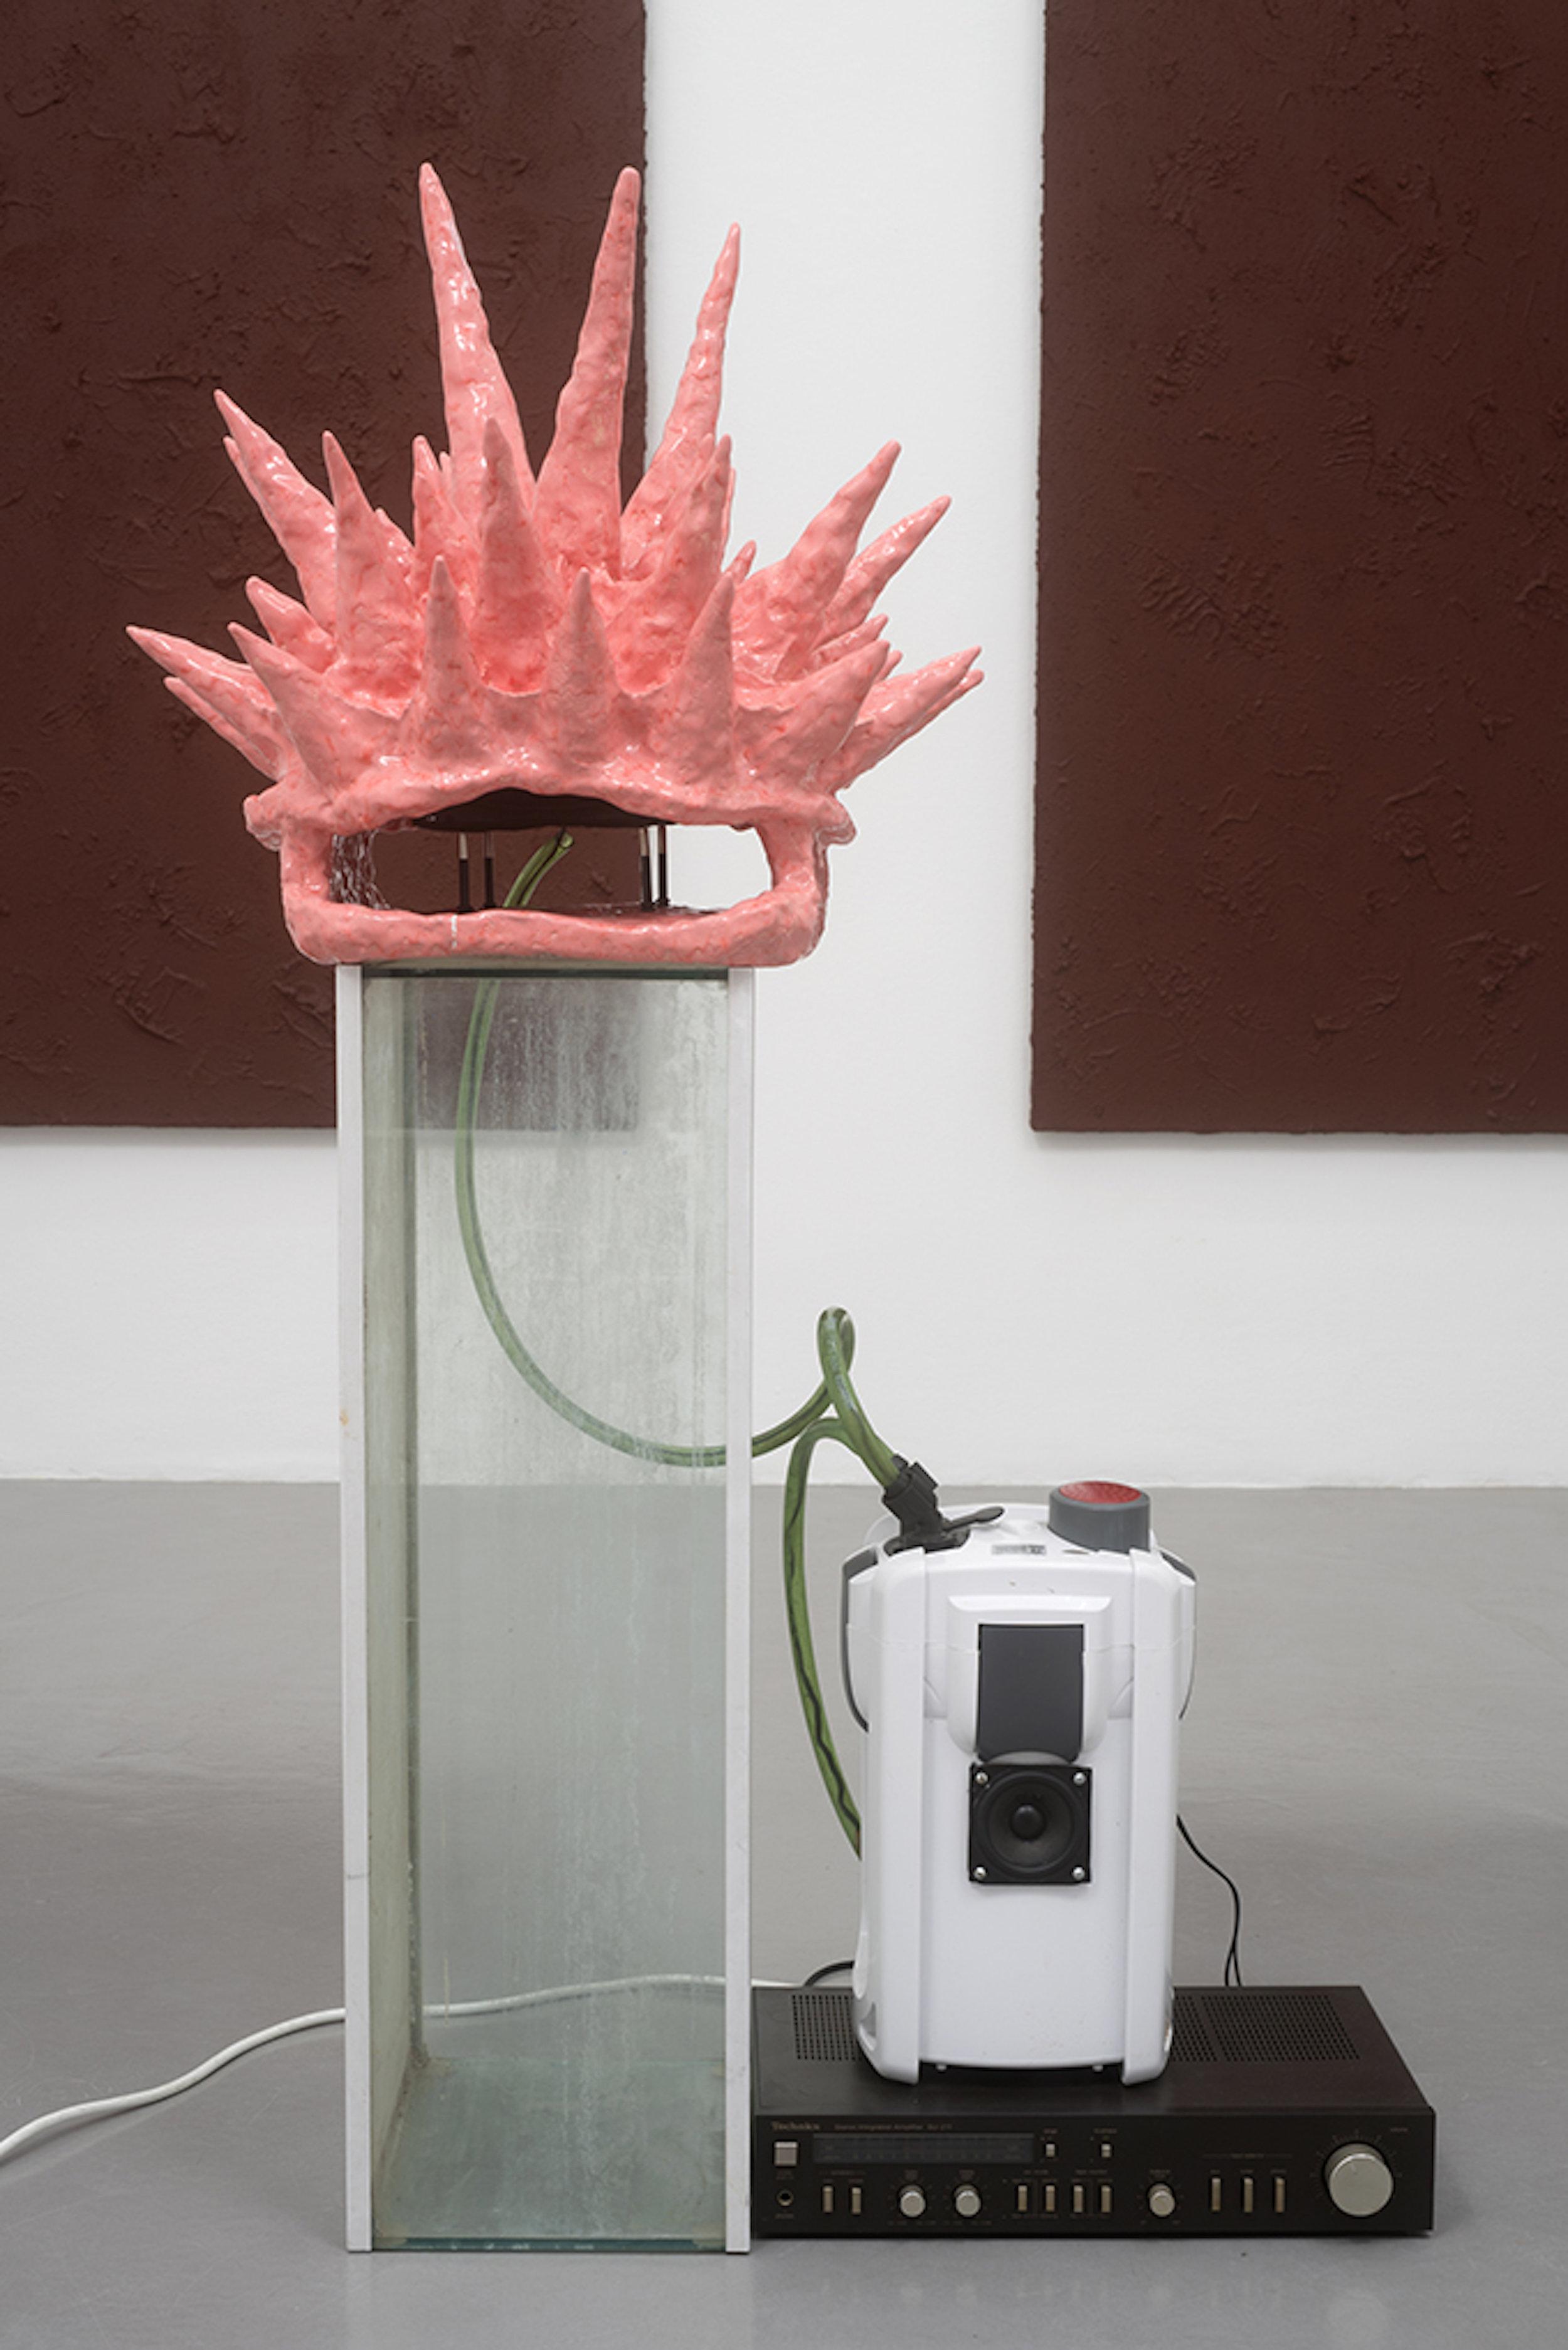 Justin Lieberman,  Turtle/Filter Dialogue 3 (Spomonik) , 2017, glazed ceramic, modified aquarium filter, electronics, sound, 52 × 27 ⅛ × 21 ⅝ in.